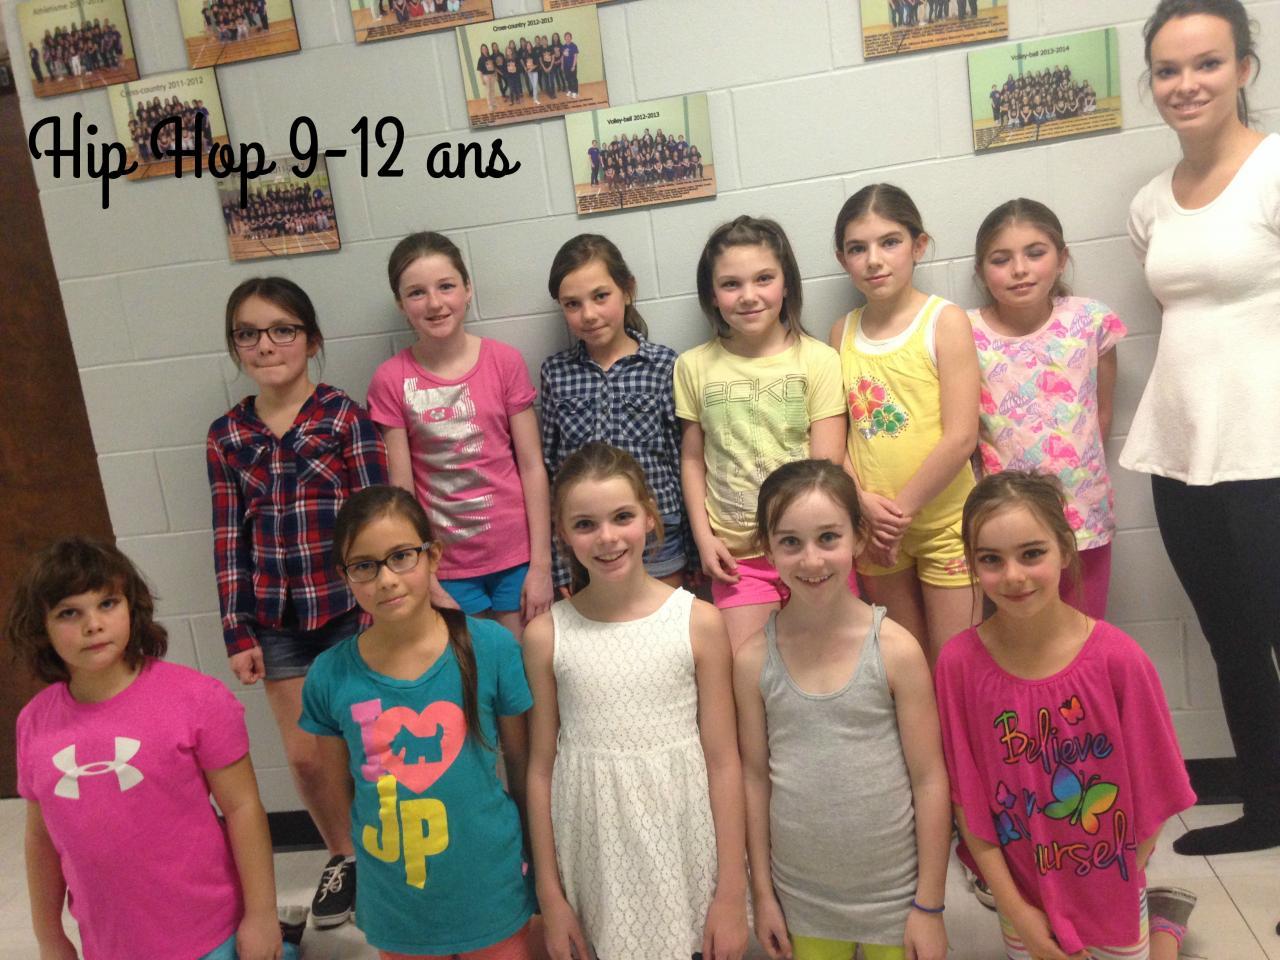 Hip Hop 9-12 ans